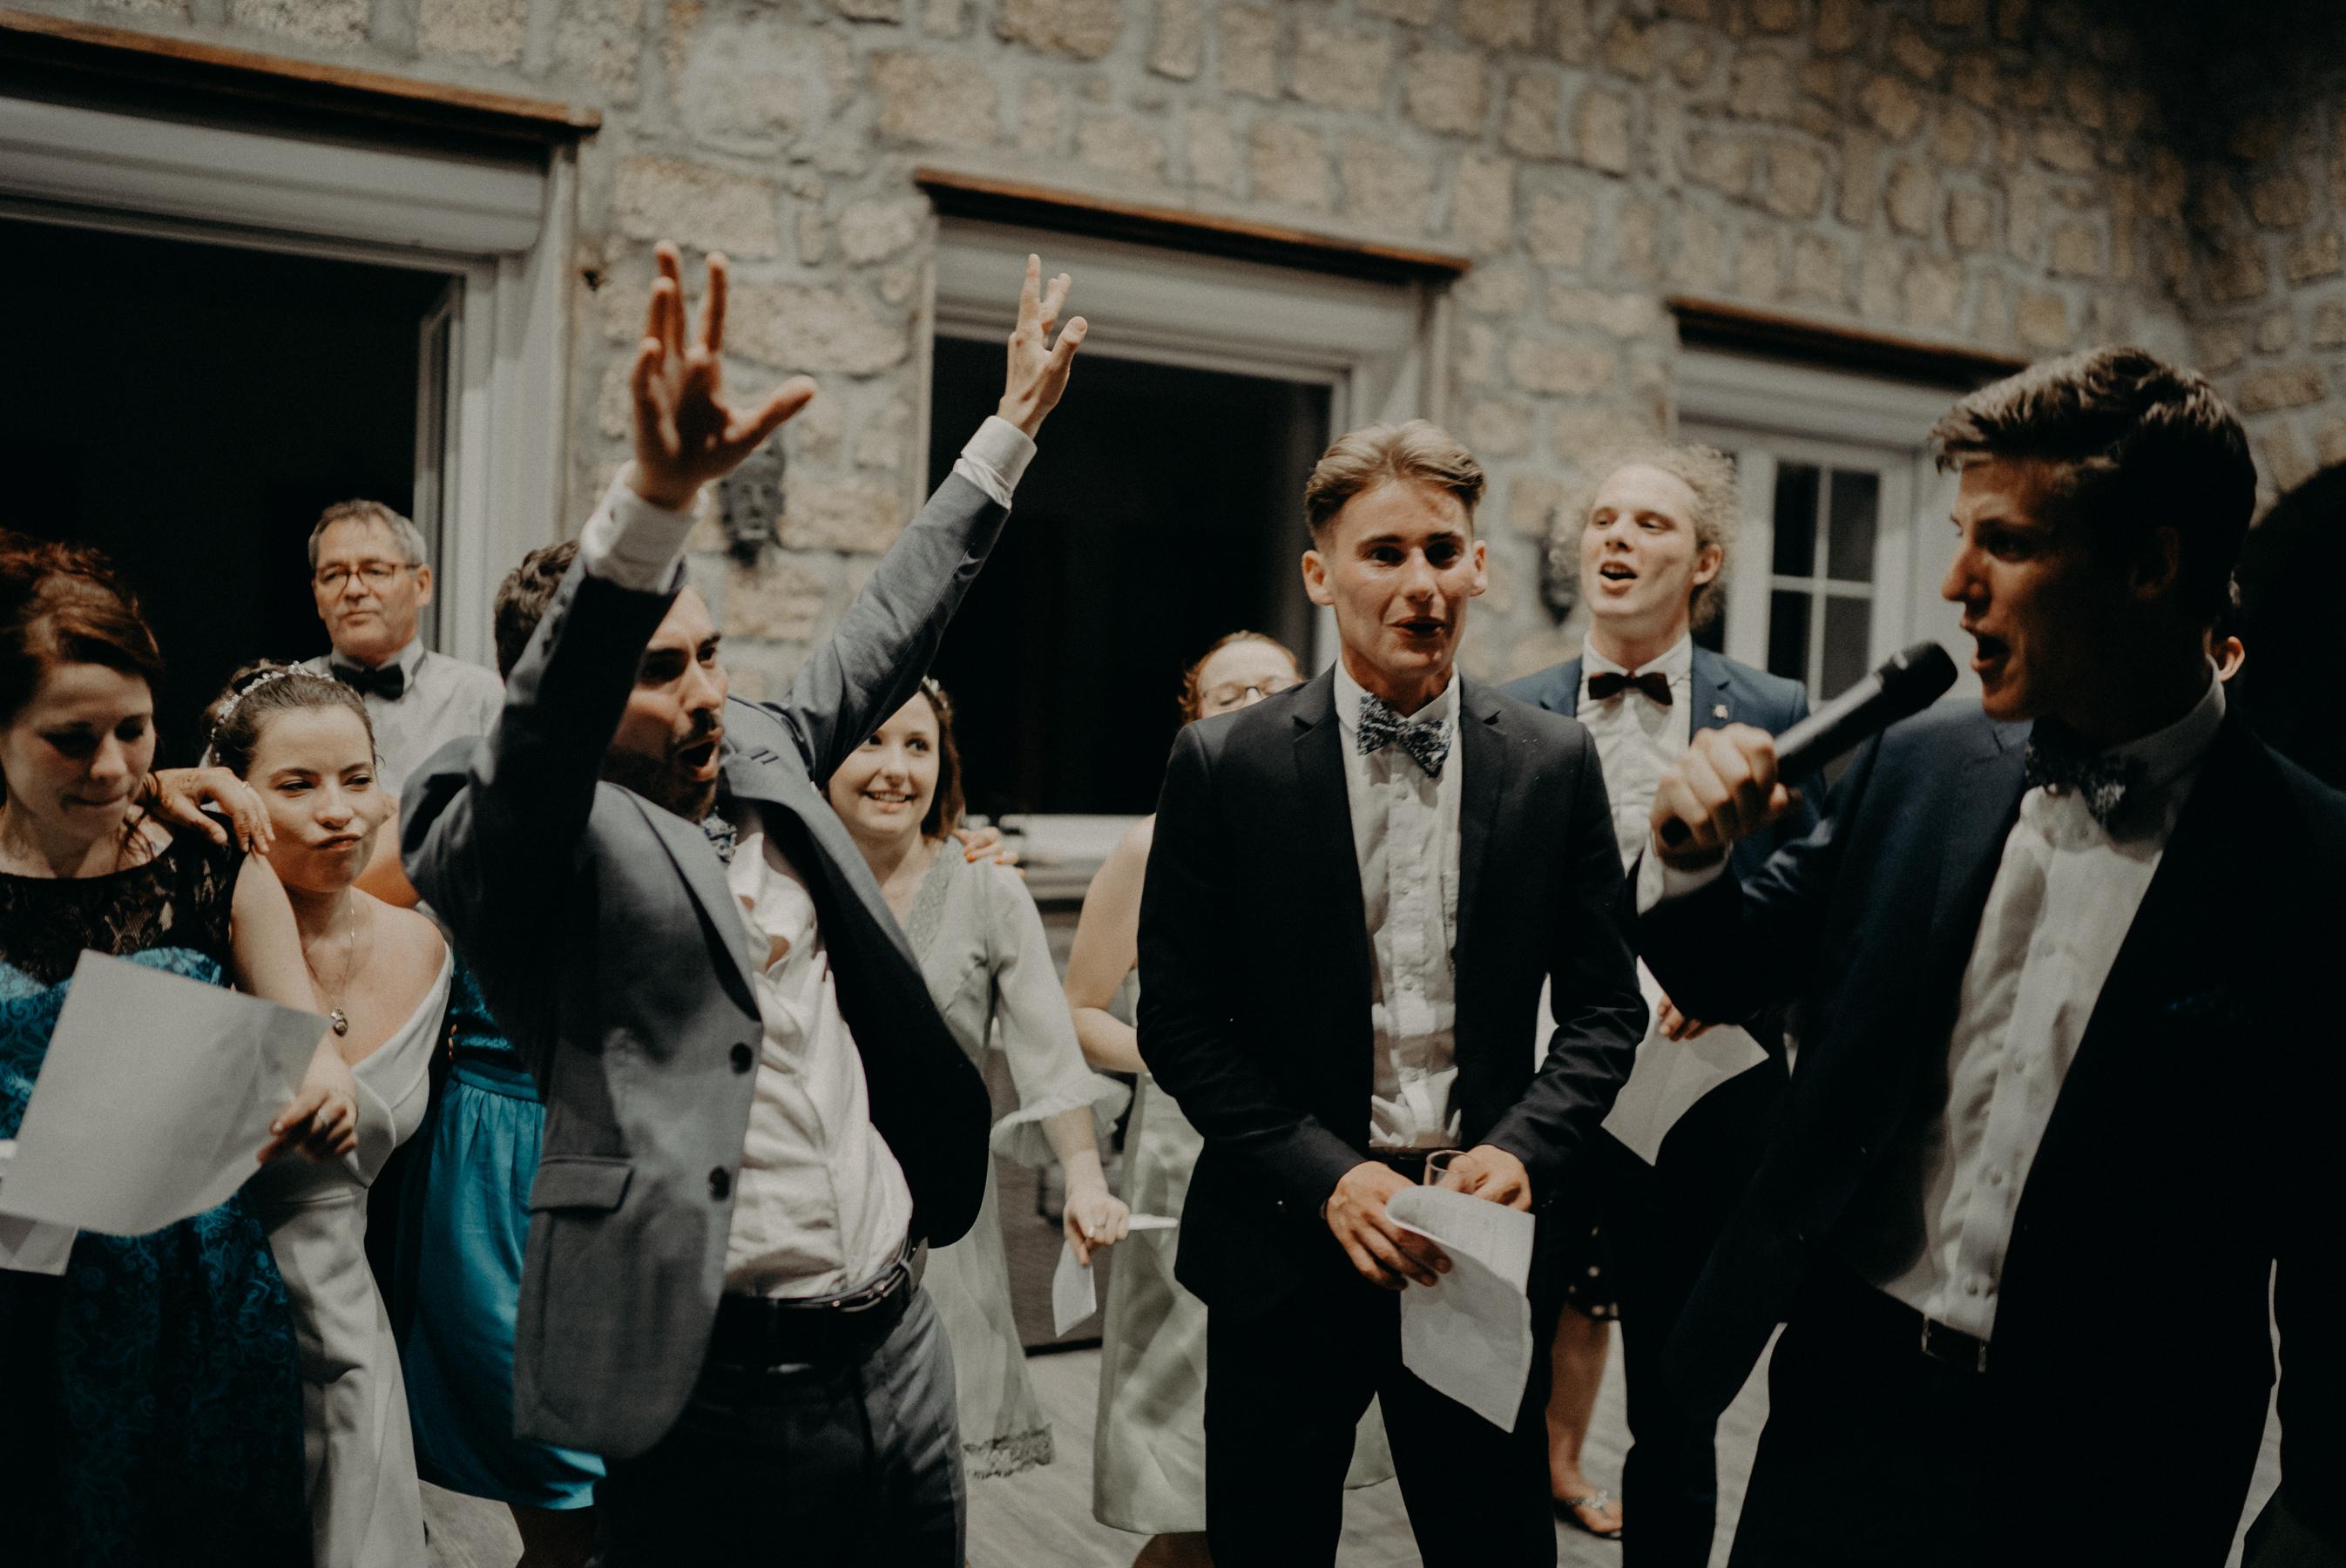 Photographe mariage Ajaccio CorsePhotographe mariage Ajaccio Corse